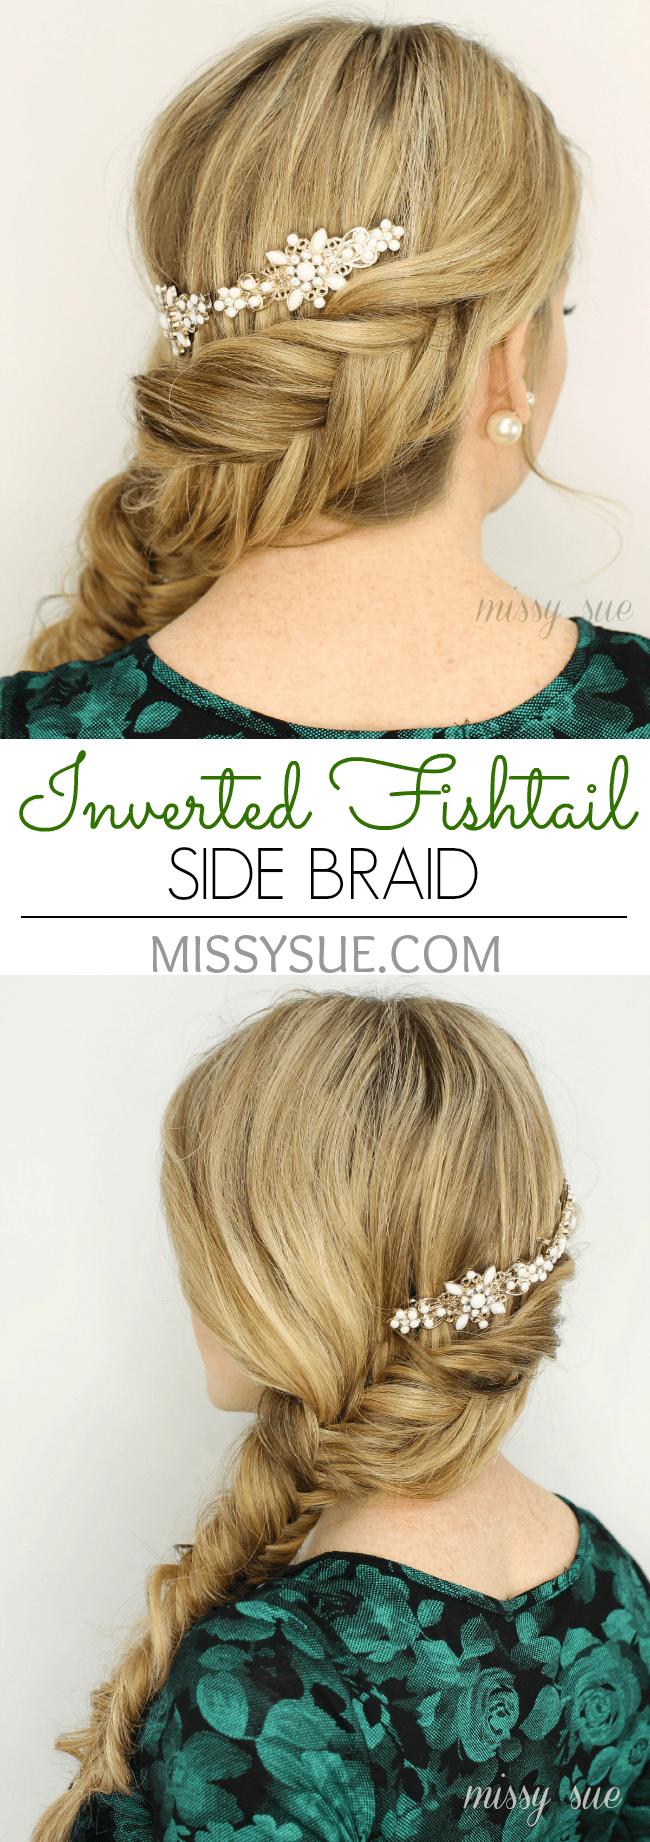 Inverted Fishtail Side Braid